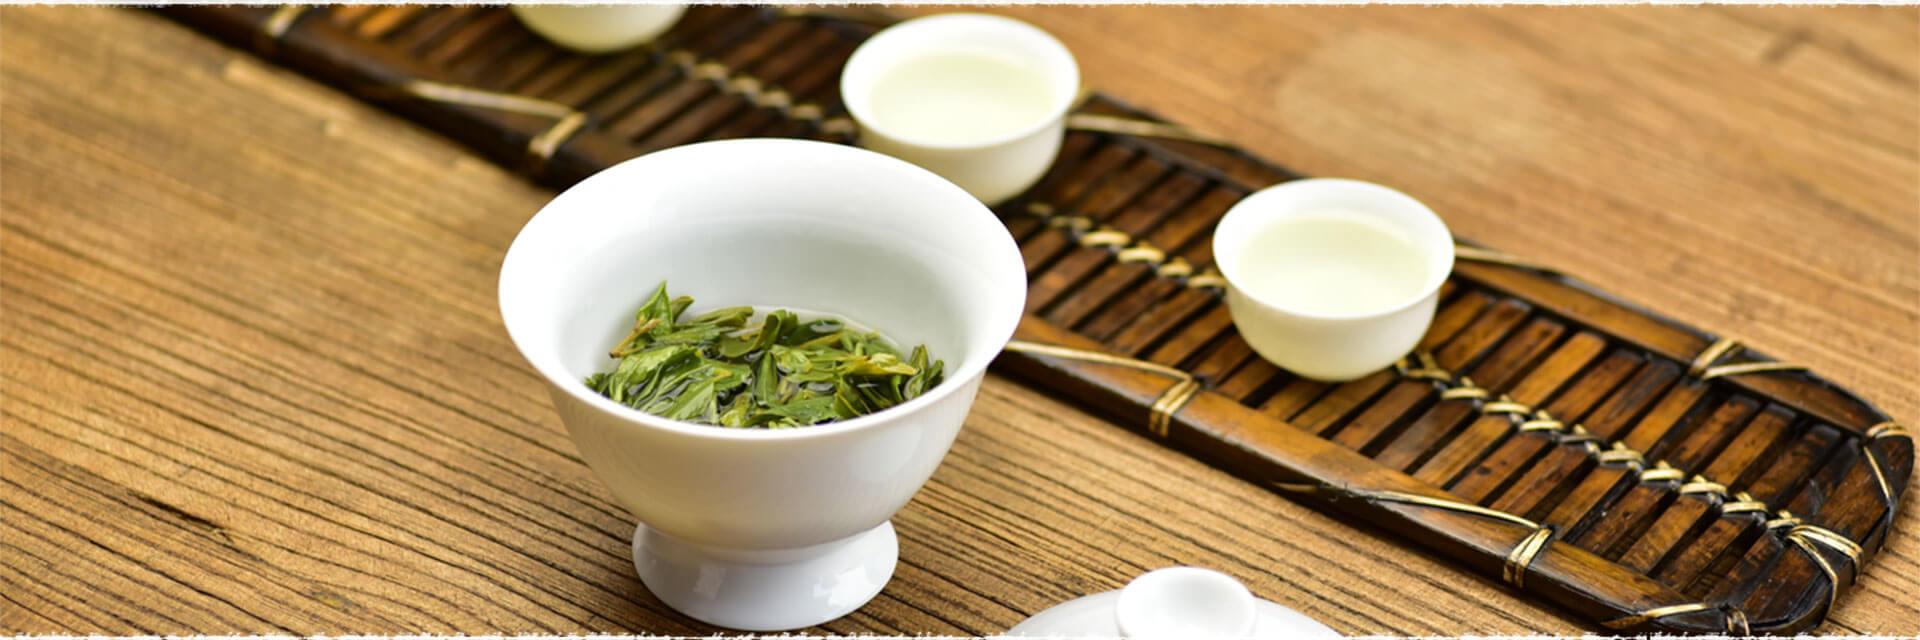 Xihu Longjing Tea – A Distinguishing Kind among Chinese Tea